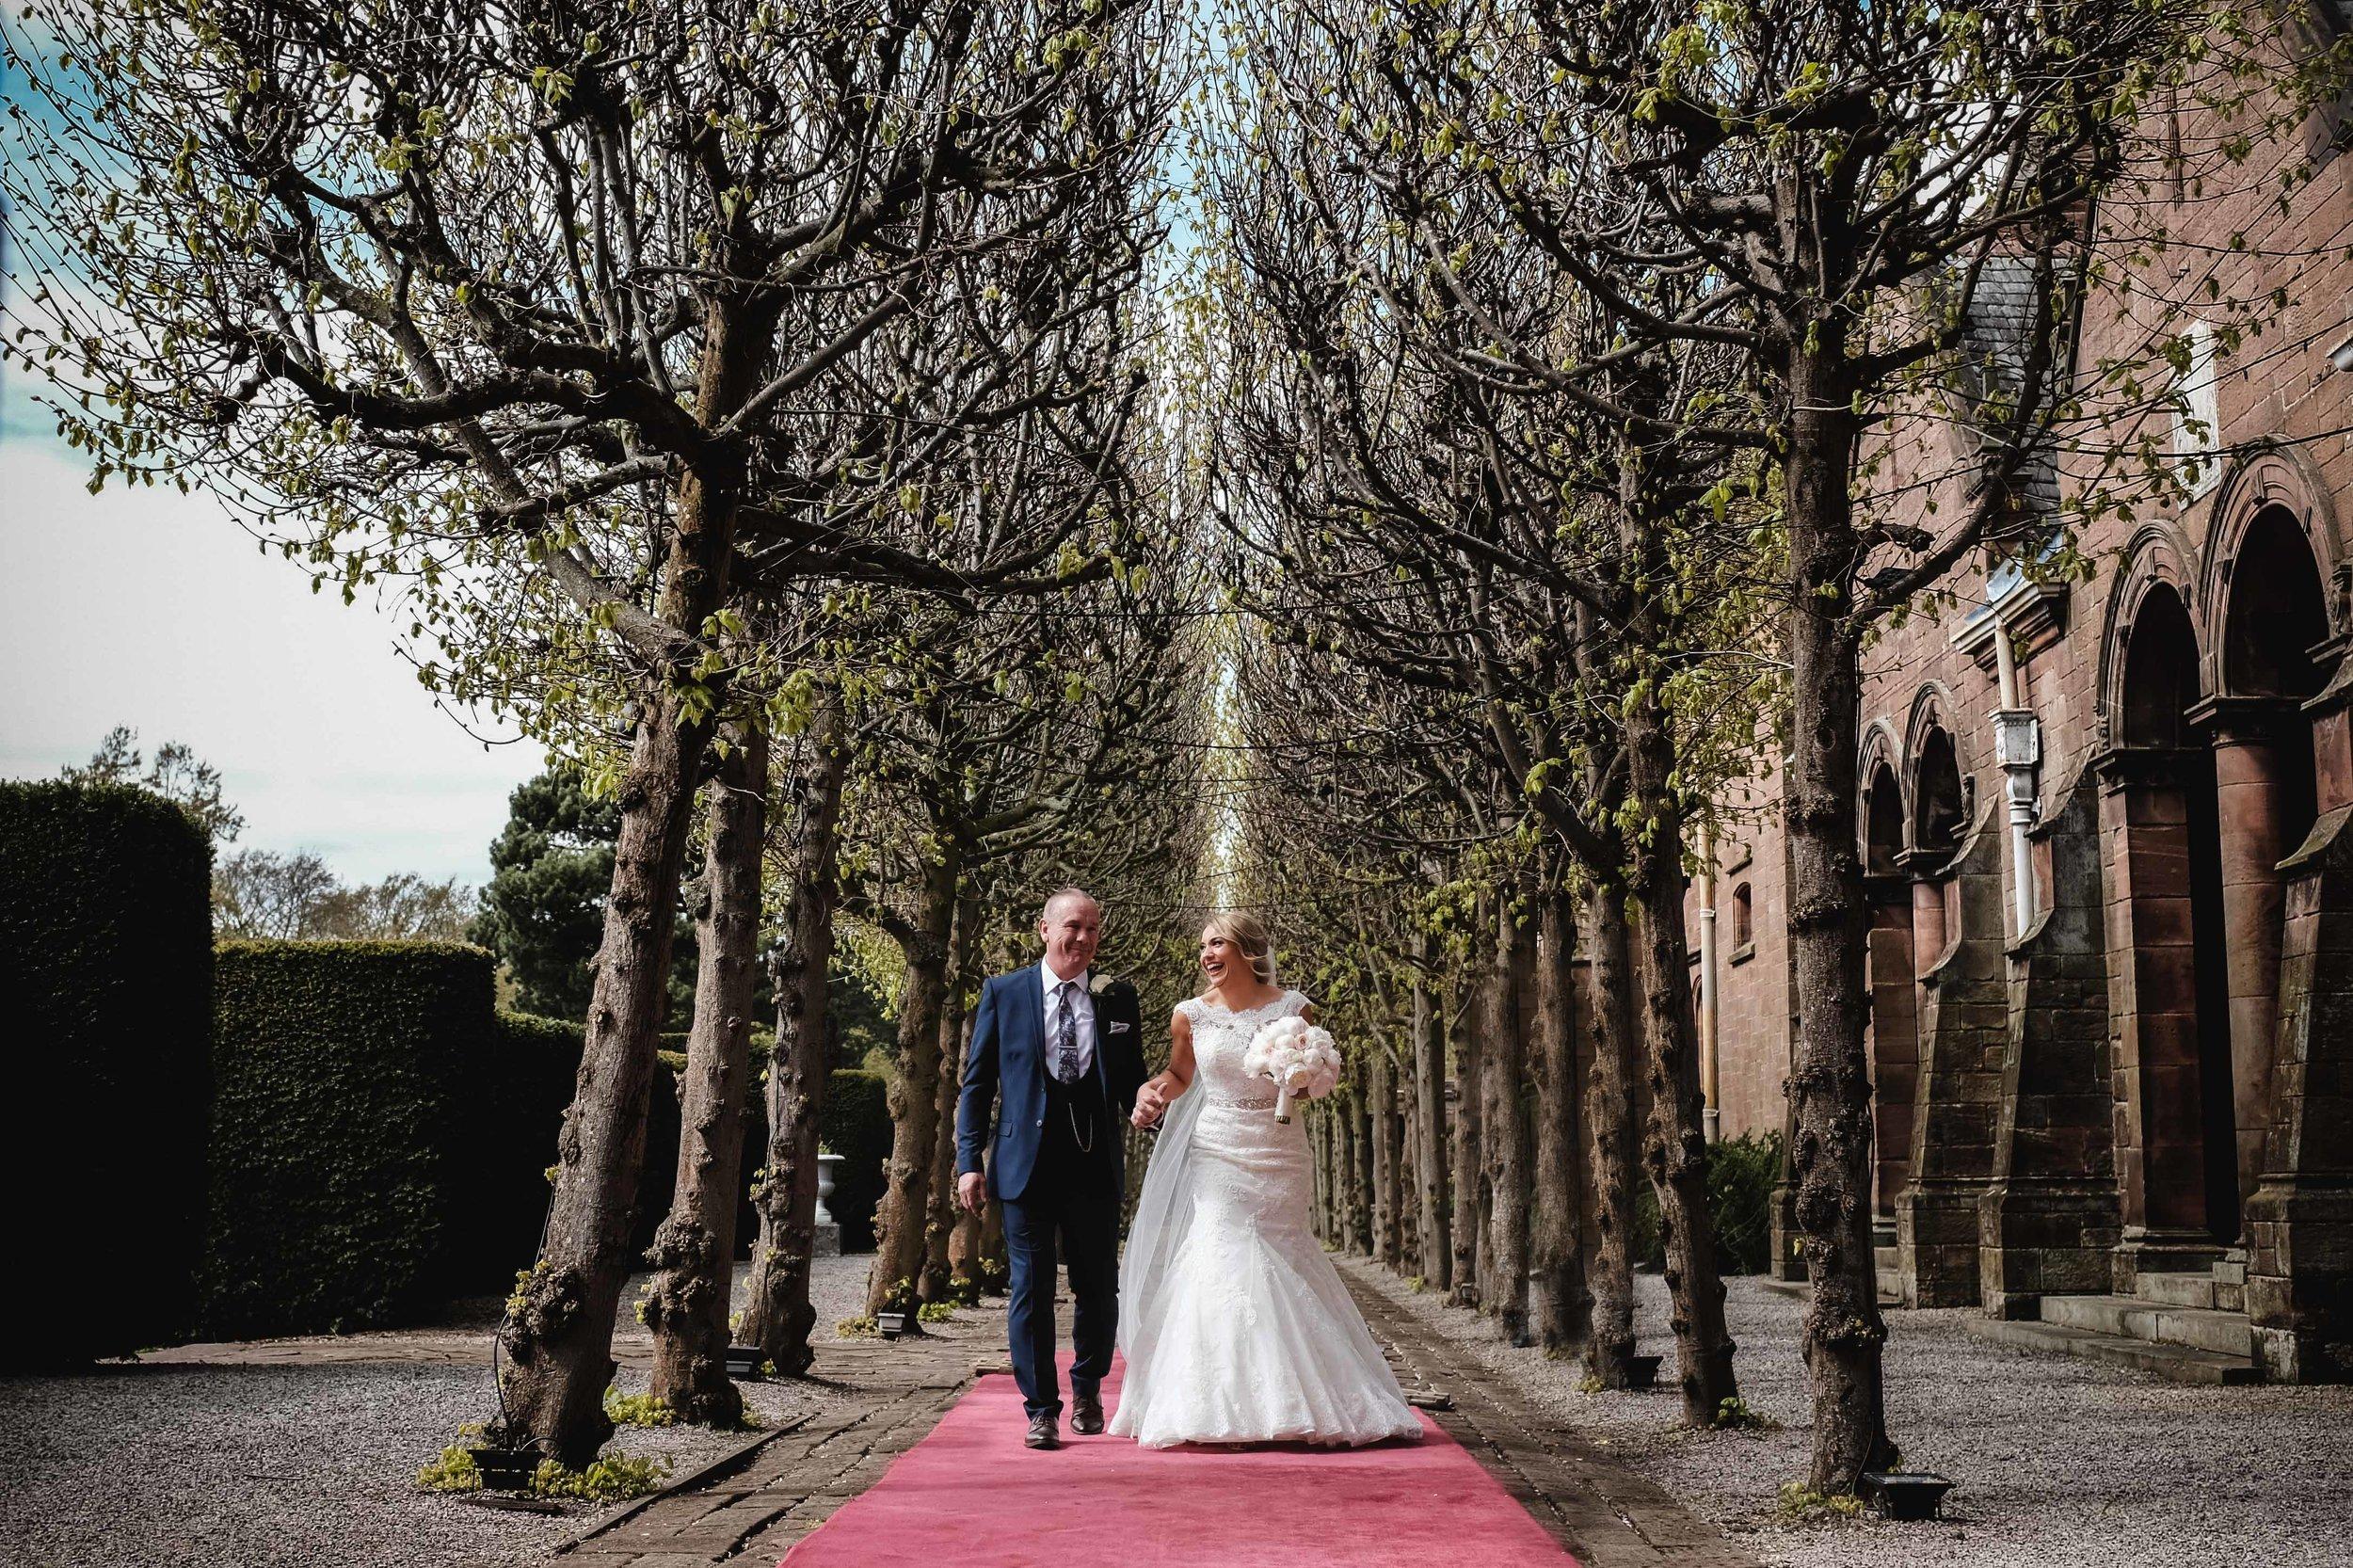 Thornton manor wedding photography cheshire wedding photographer liverpool manchester warrington chester wirral wedding BLOG (34 of 108).jpg